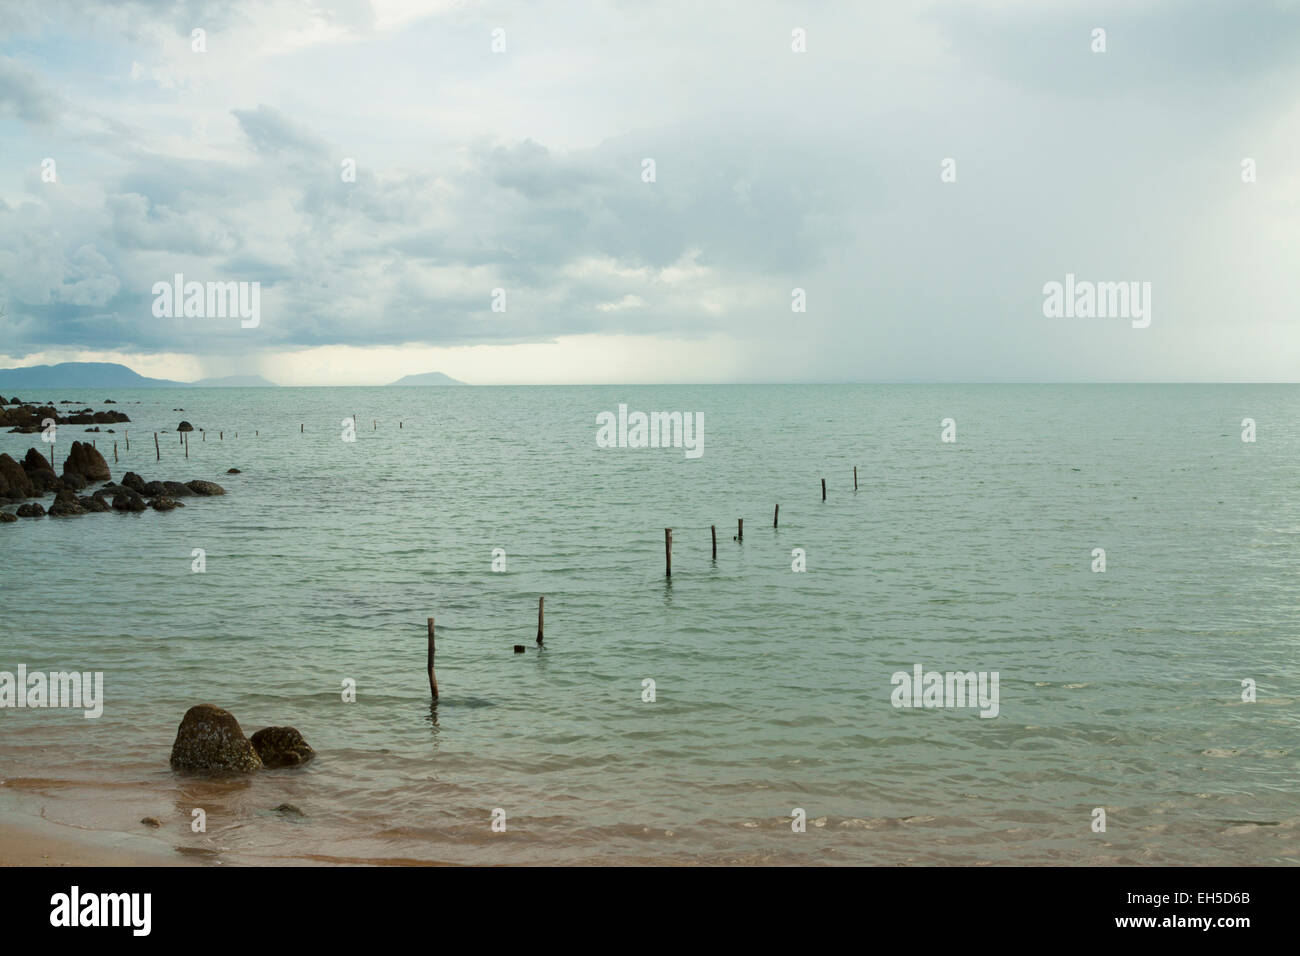 Tropical rainstorm approaching over the sea - Rabbit island (Tonsay island), Kep, Cambodia. - Stock Image